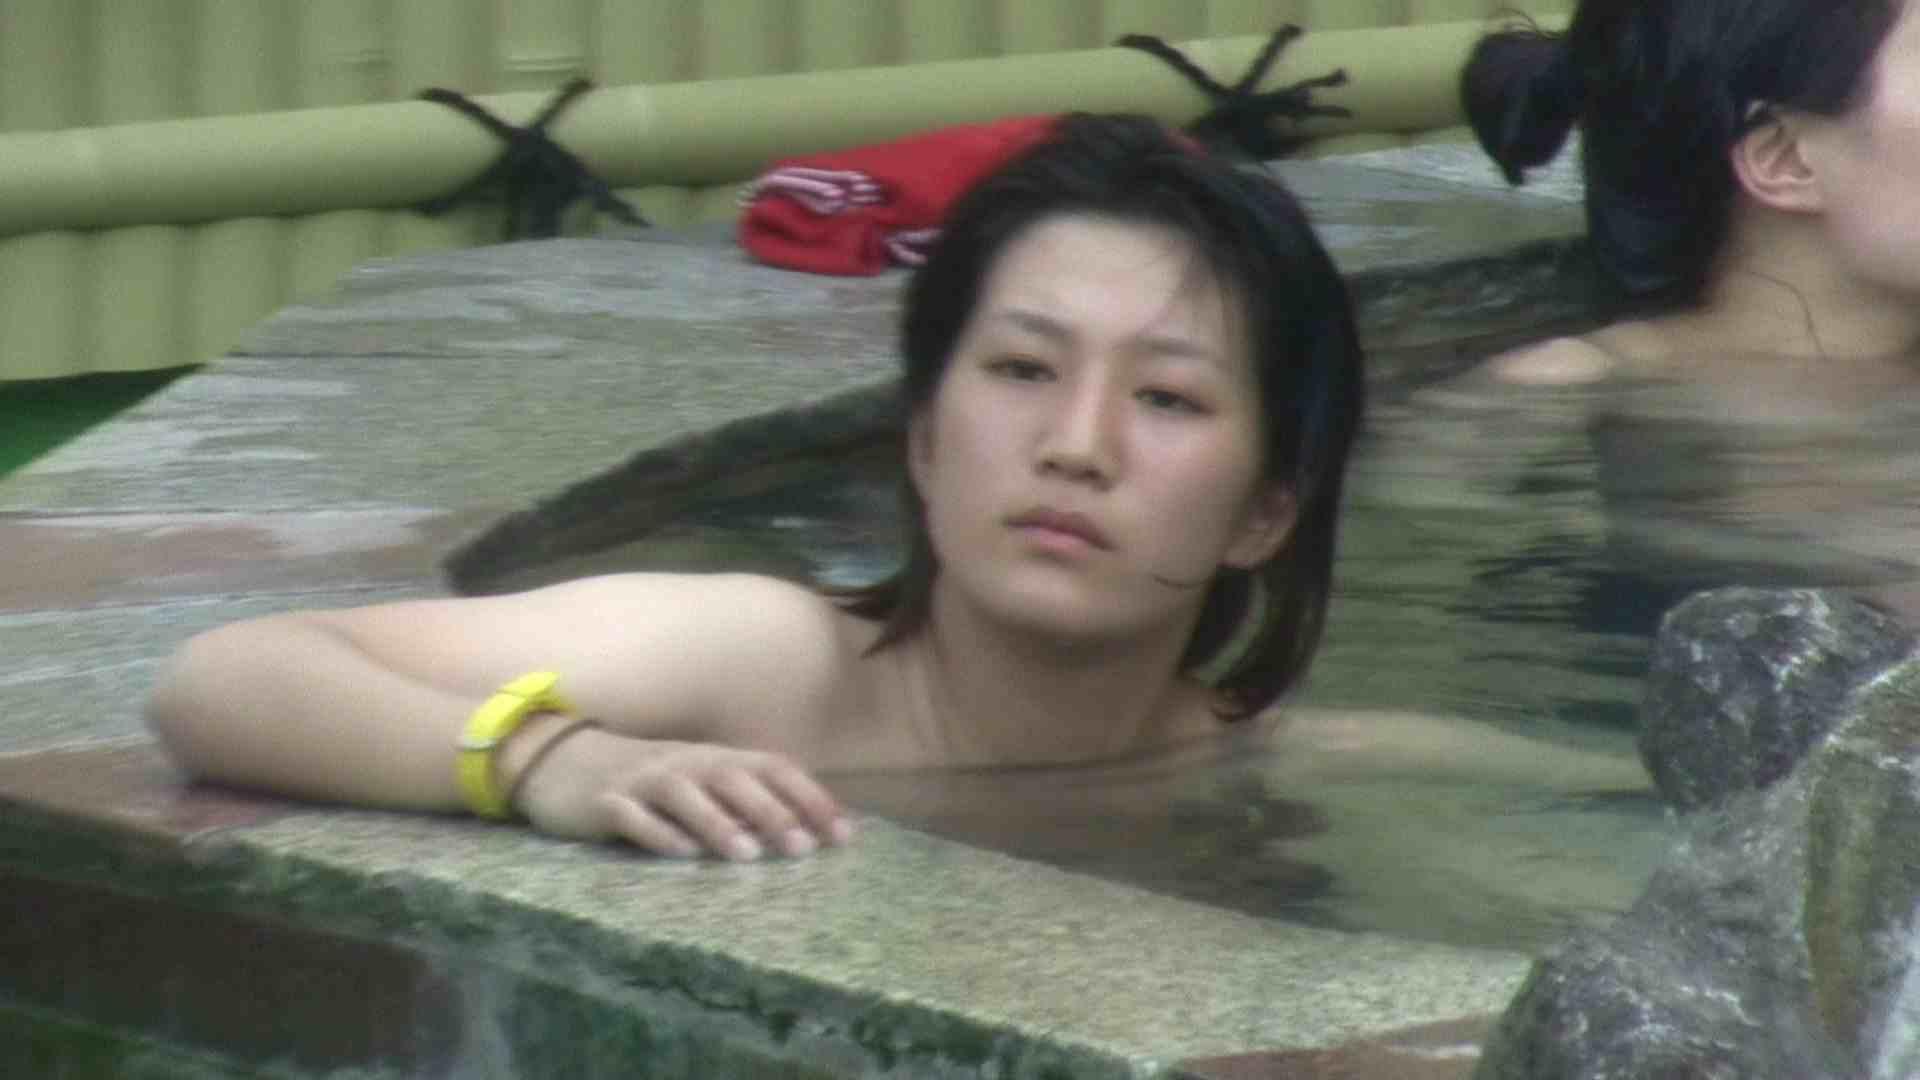 Aquaな露天風呂Vol.132 0  61連発 20